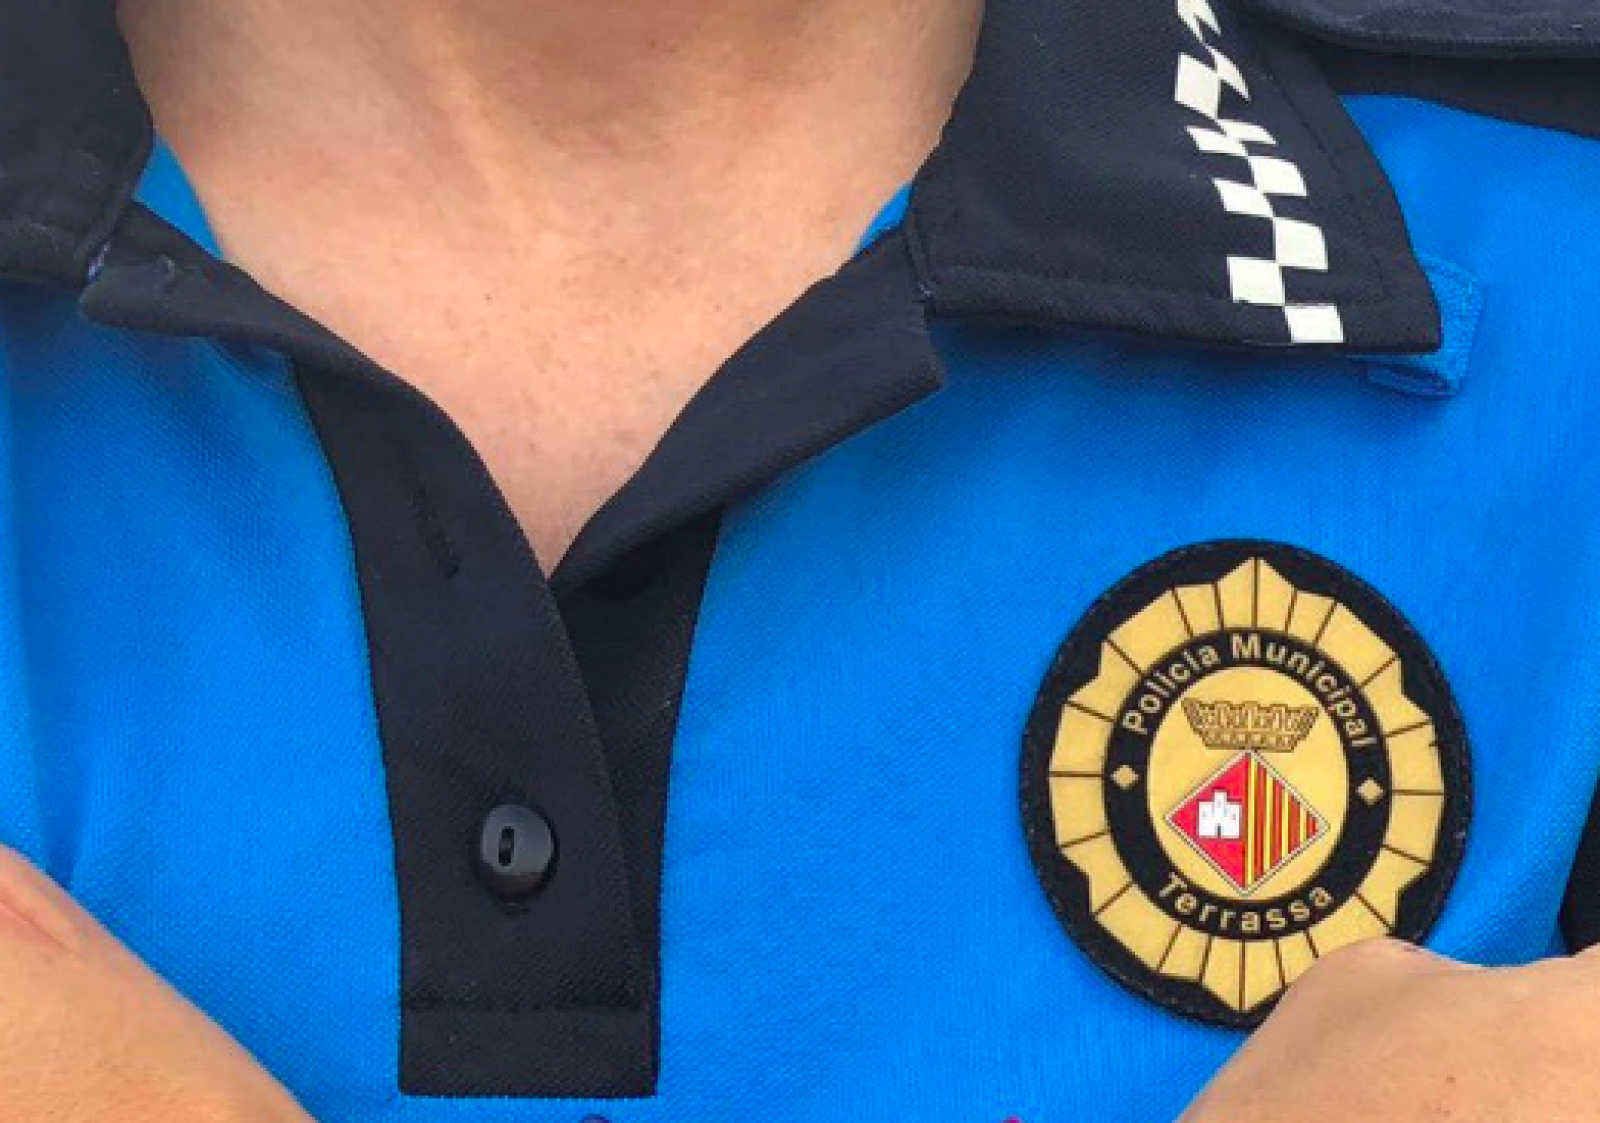 Un agent de la Policia Municipal de Terrassa